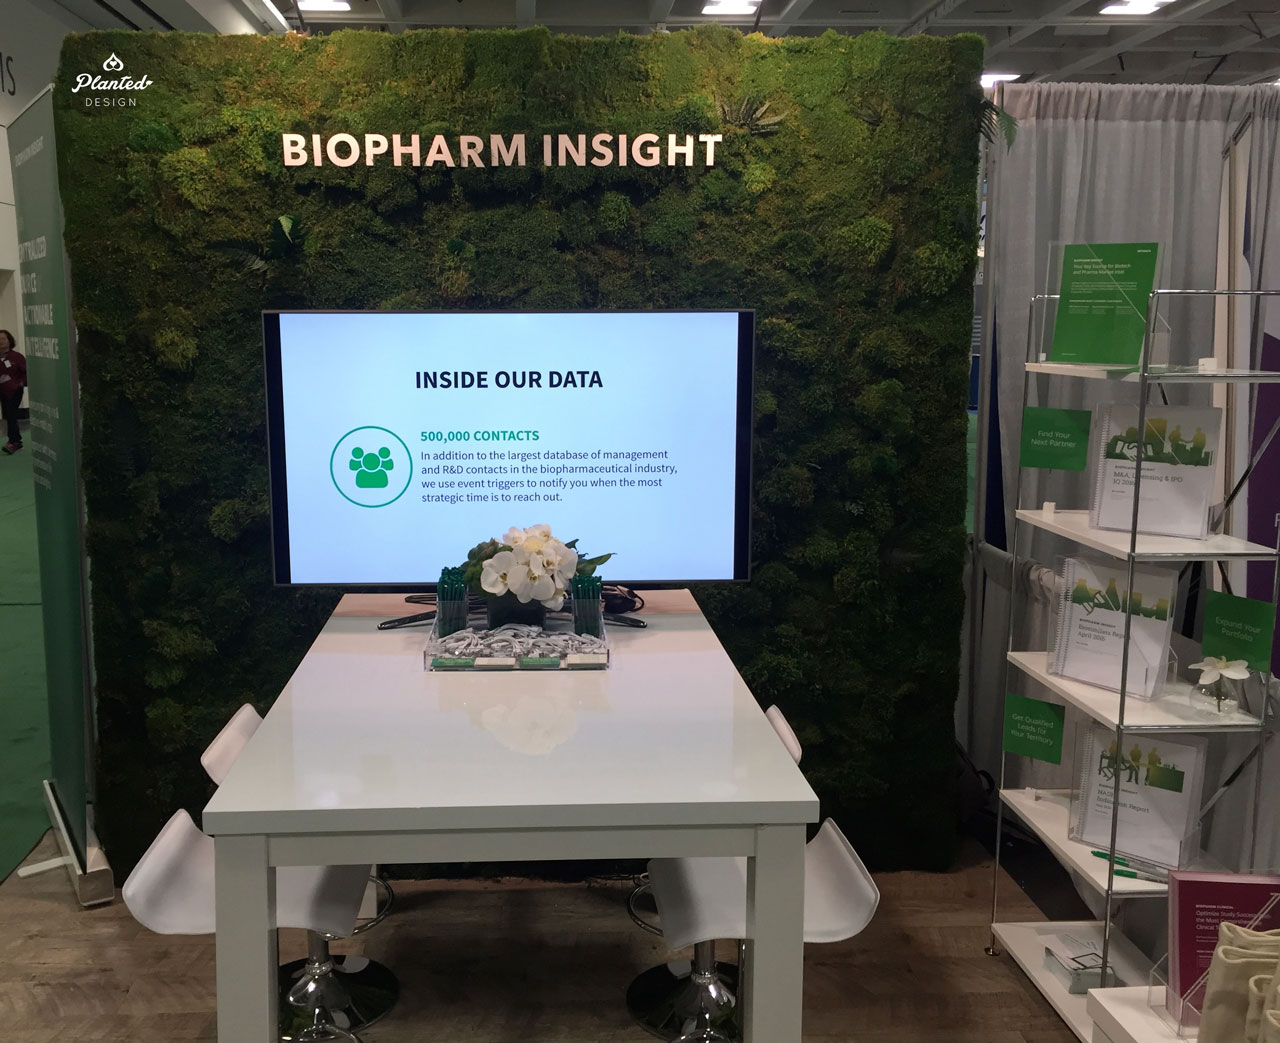 PlantedDesign-Moss-Wall-SF-BiopharmInsight1.jpg